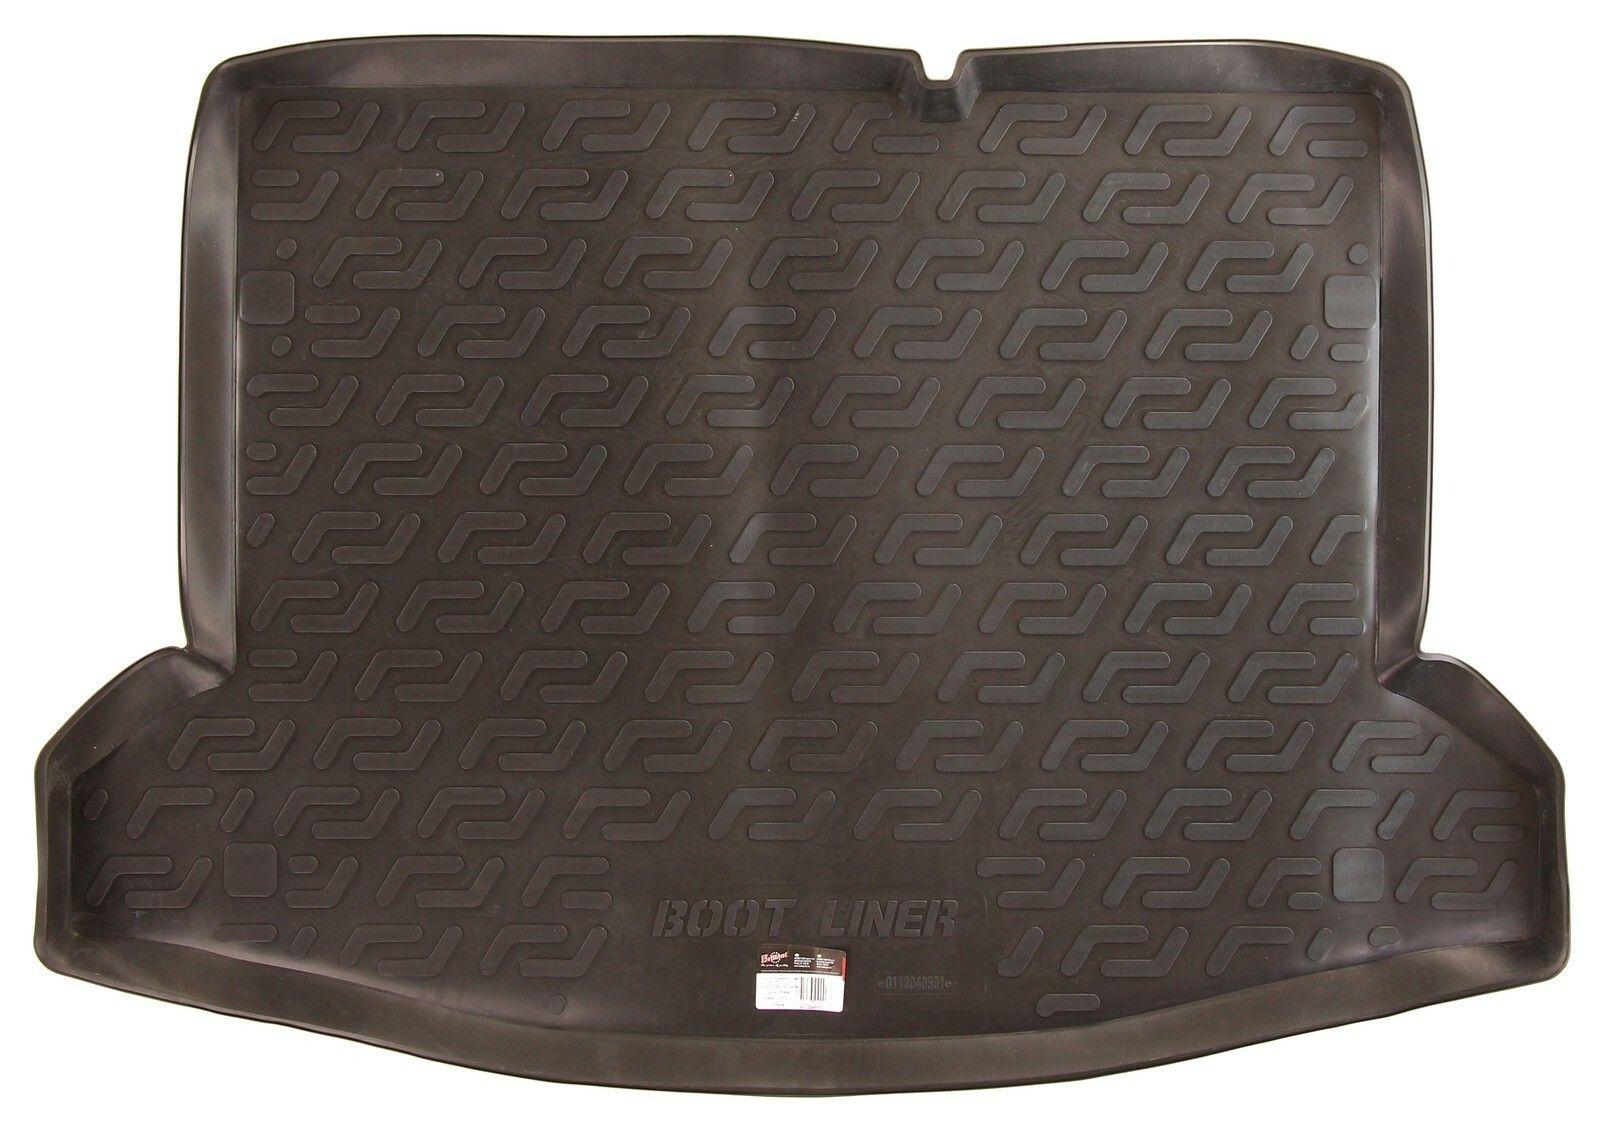 Vana do kufru gumová Suzuki SX4 II (JY) (spodní patro kufru) (13-)